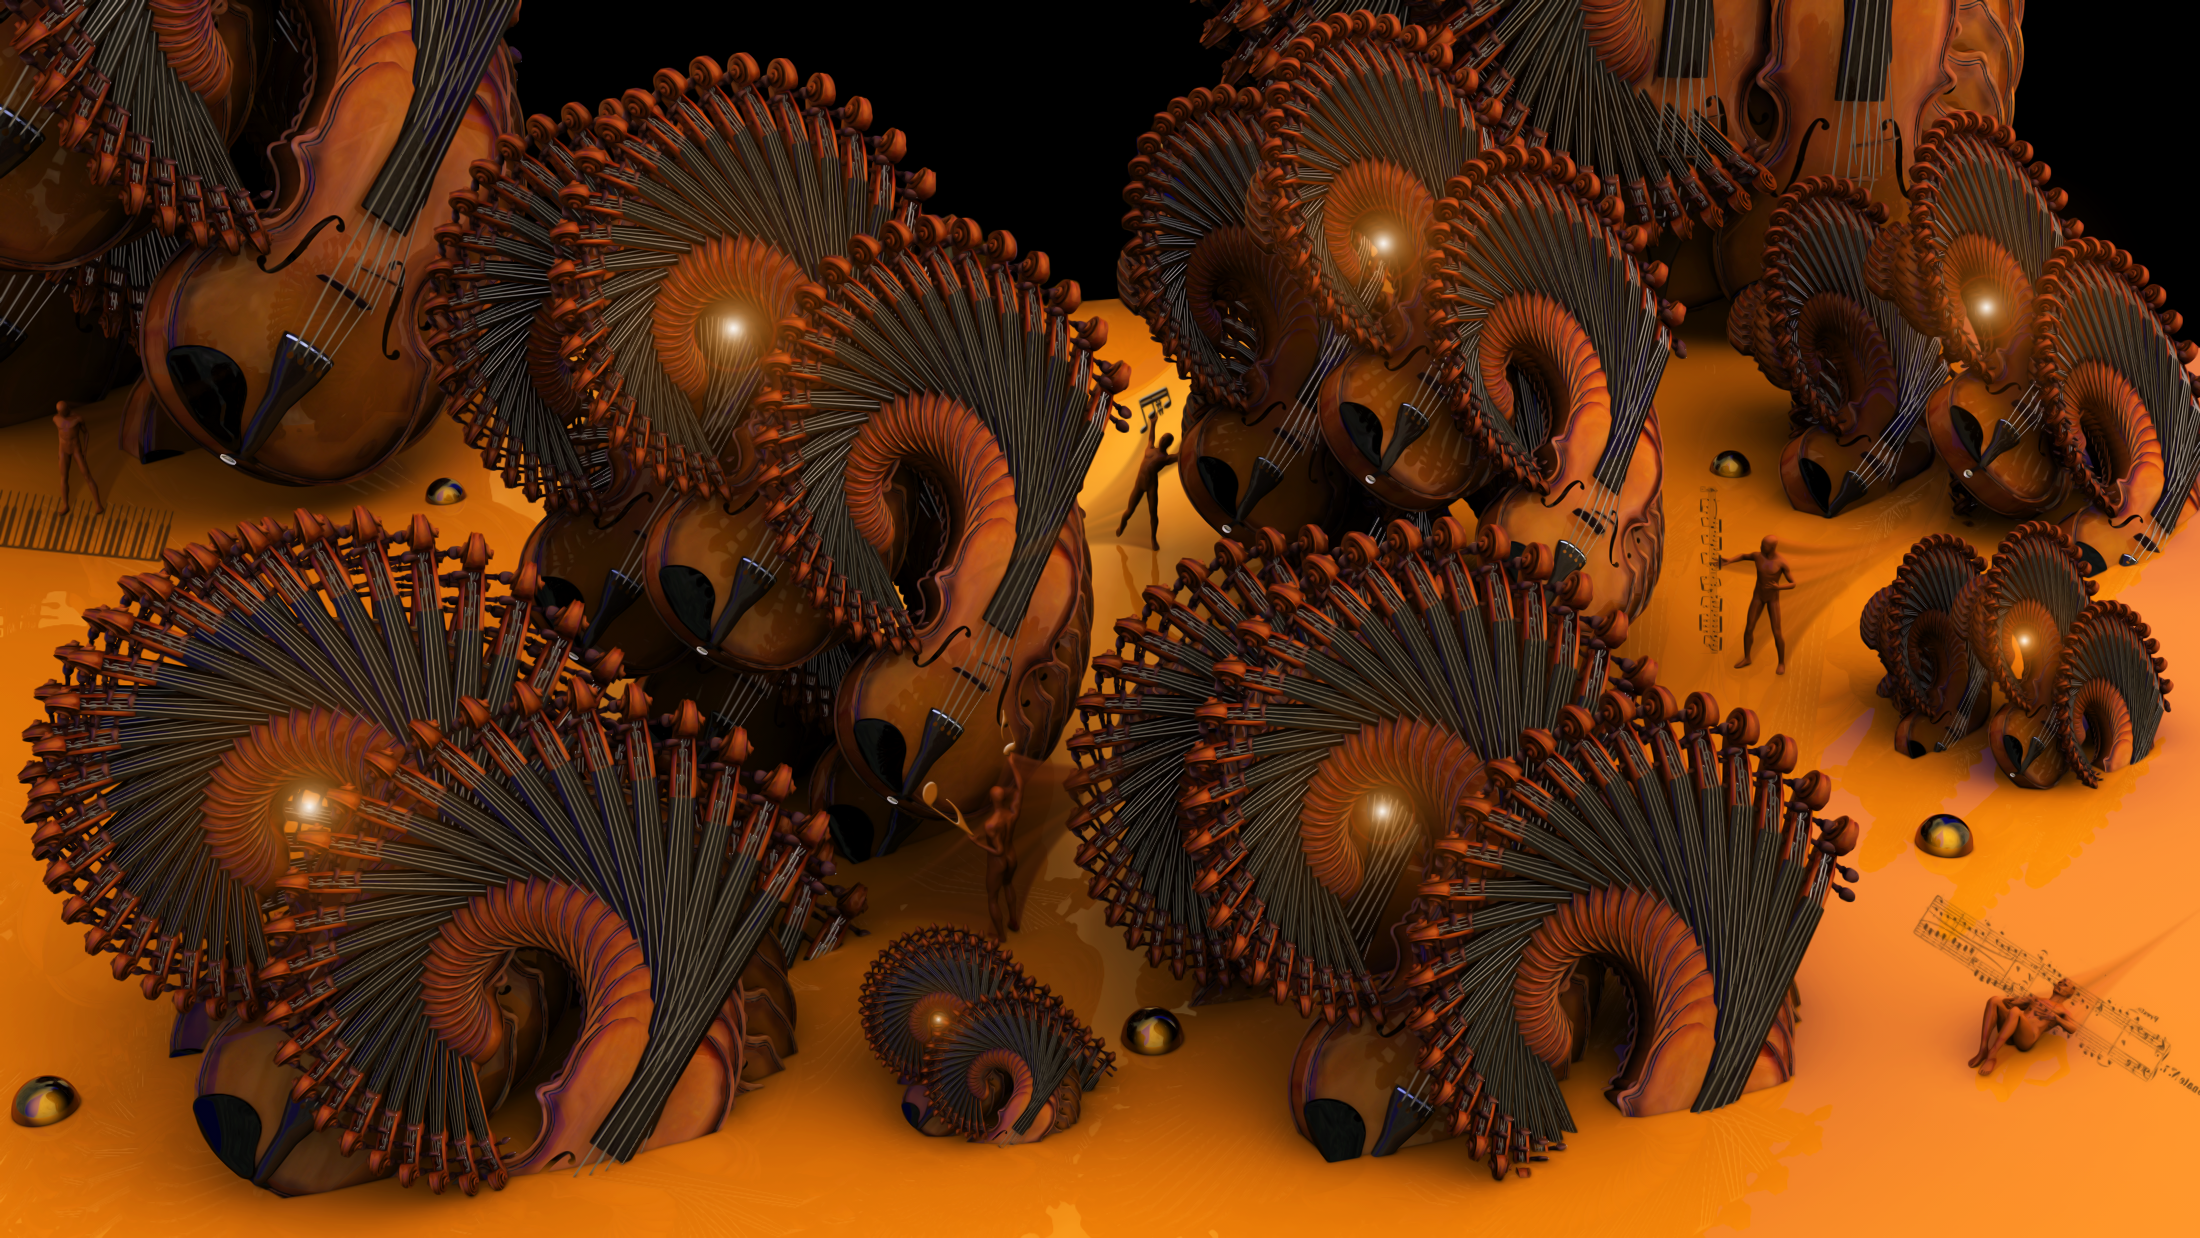 1000 Violins by pazoozoo